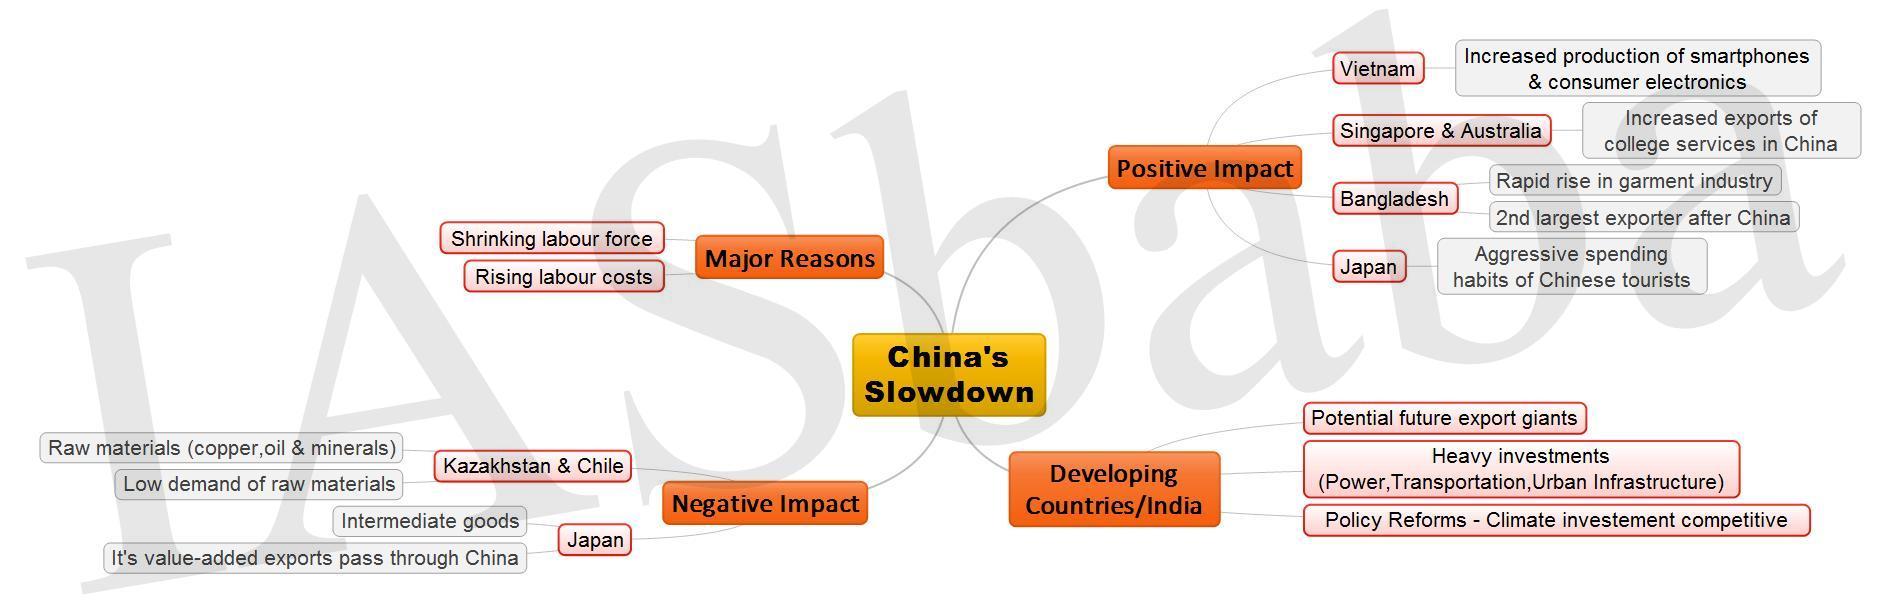 Chinas Slowdown JPEG